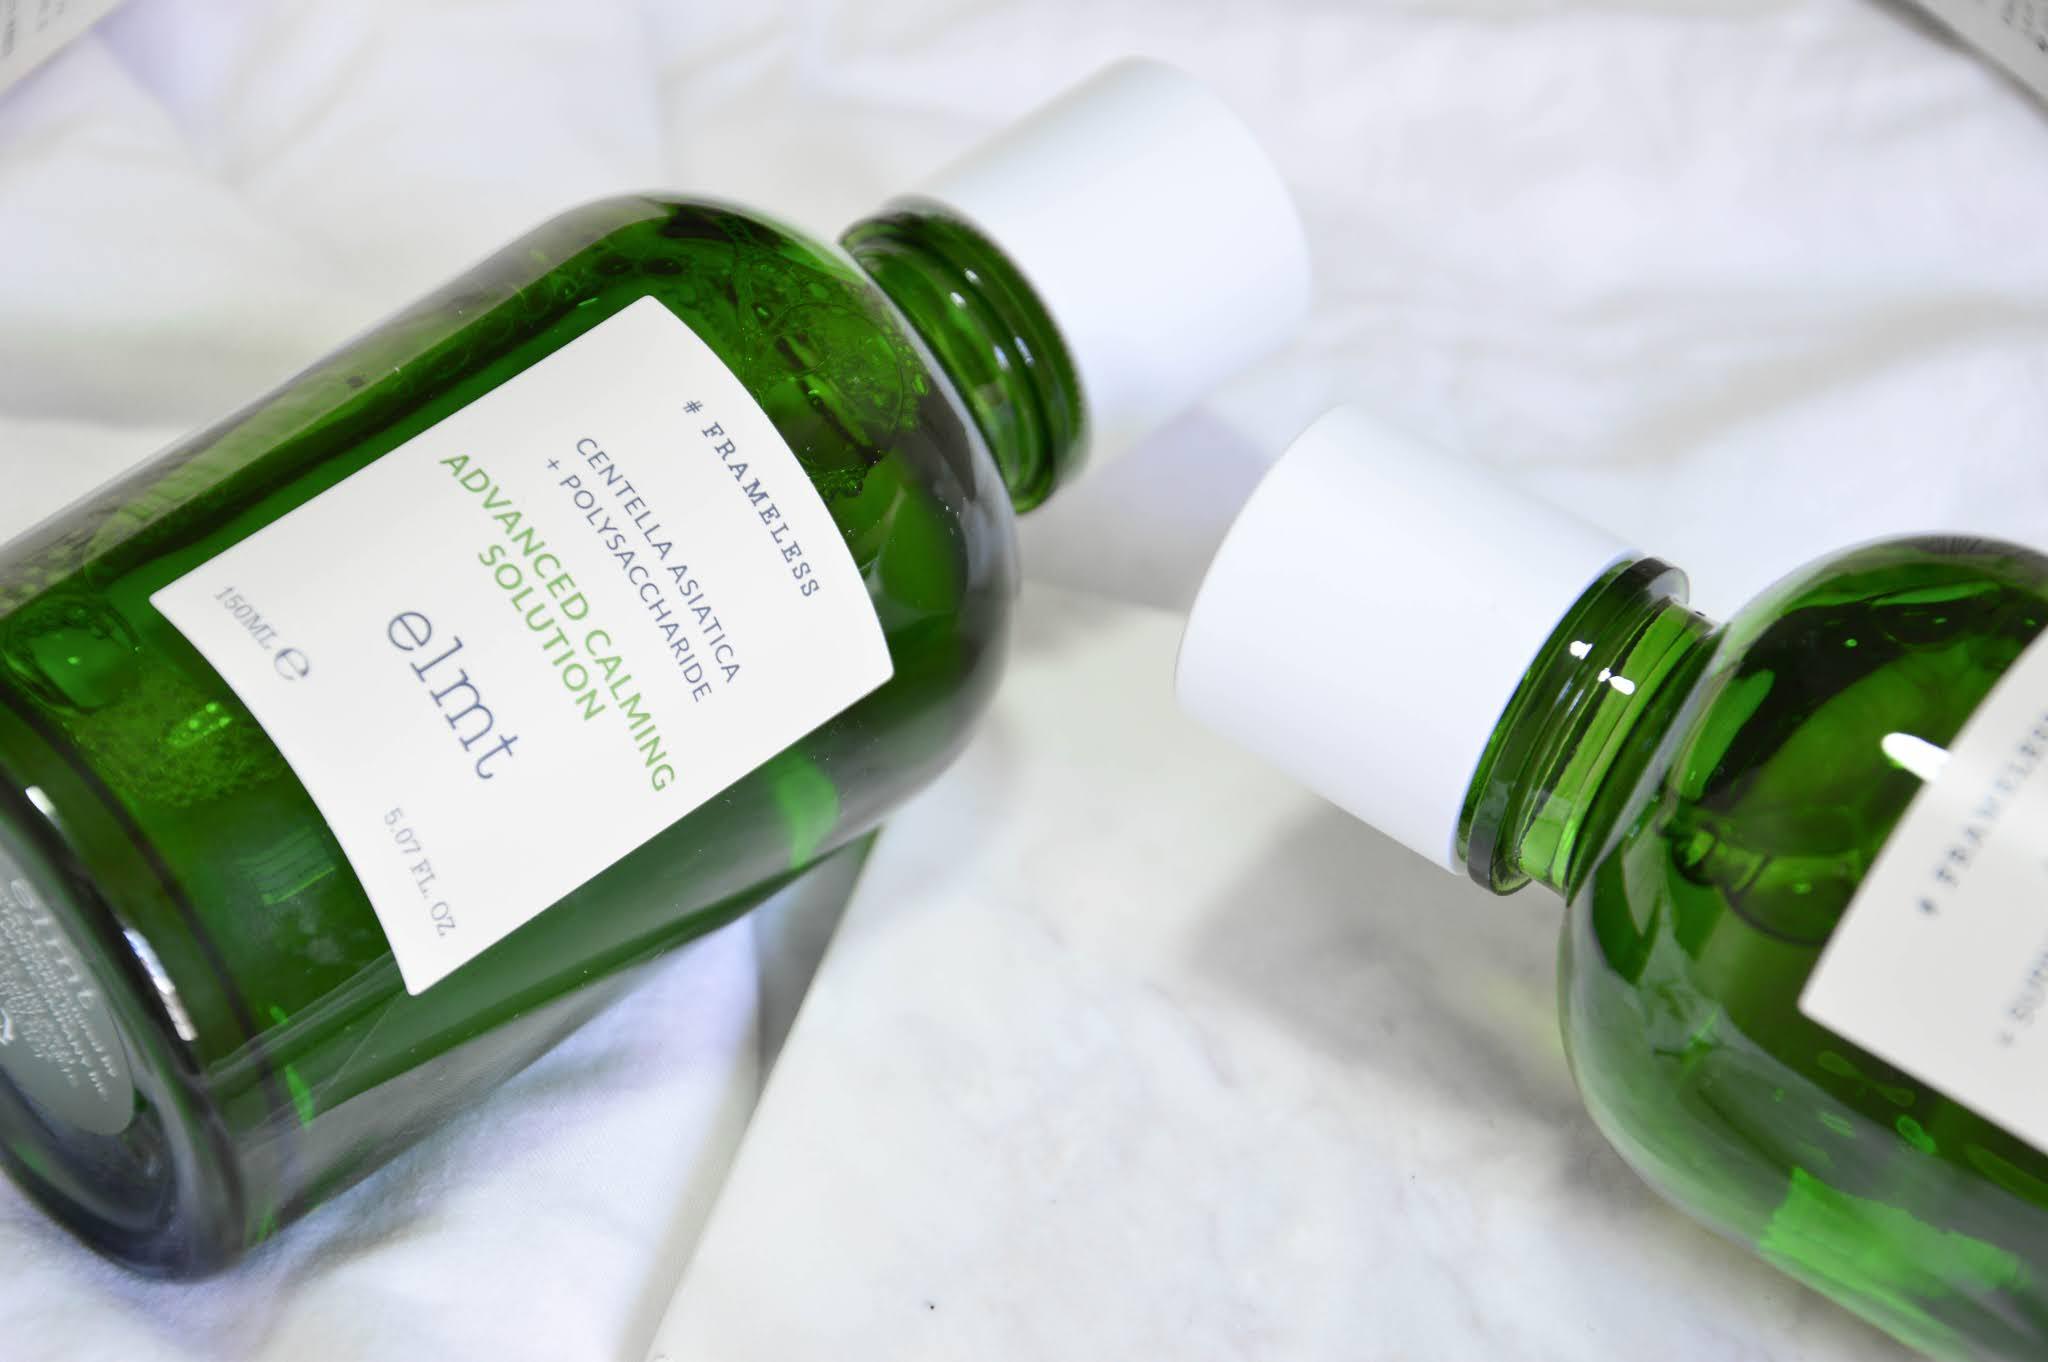 emlt Advanced Calming Solution review